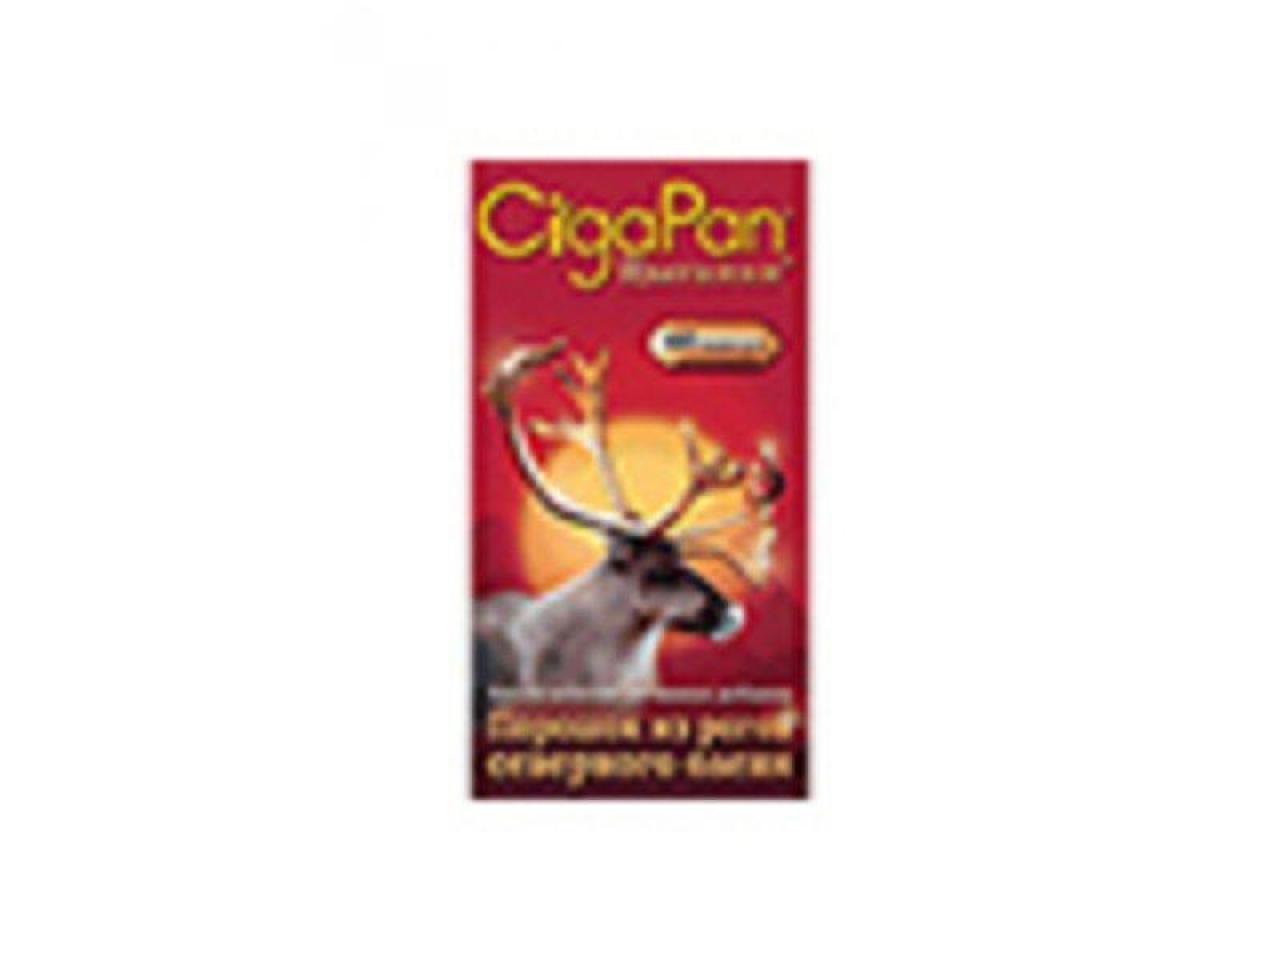 CigaPan 400 mg - 1